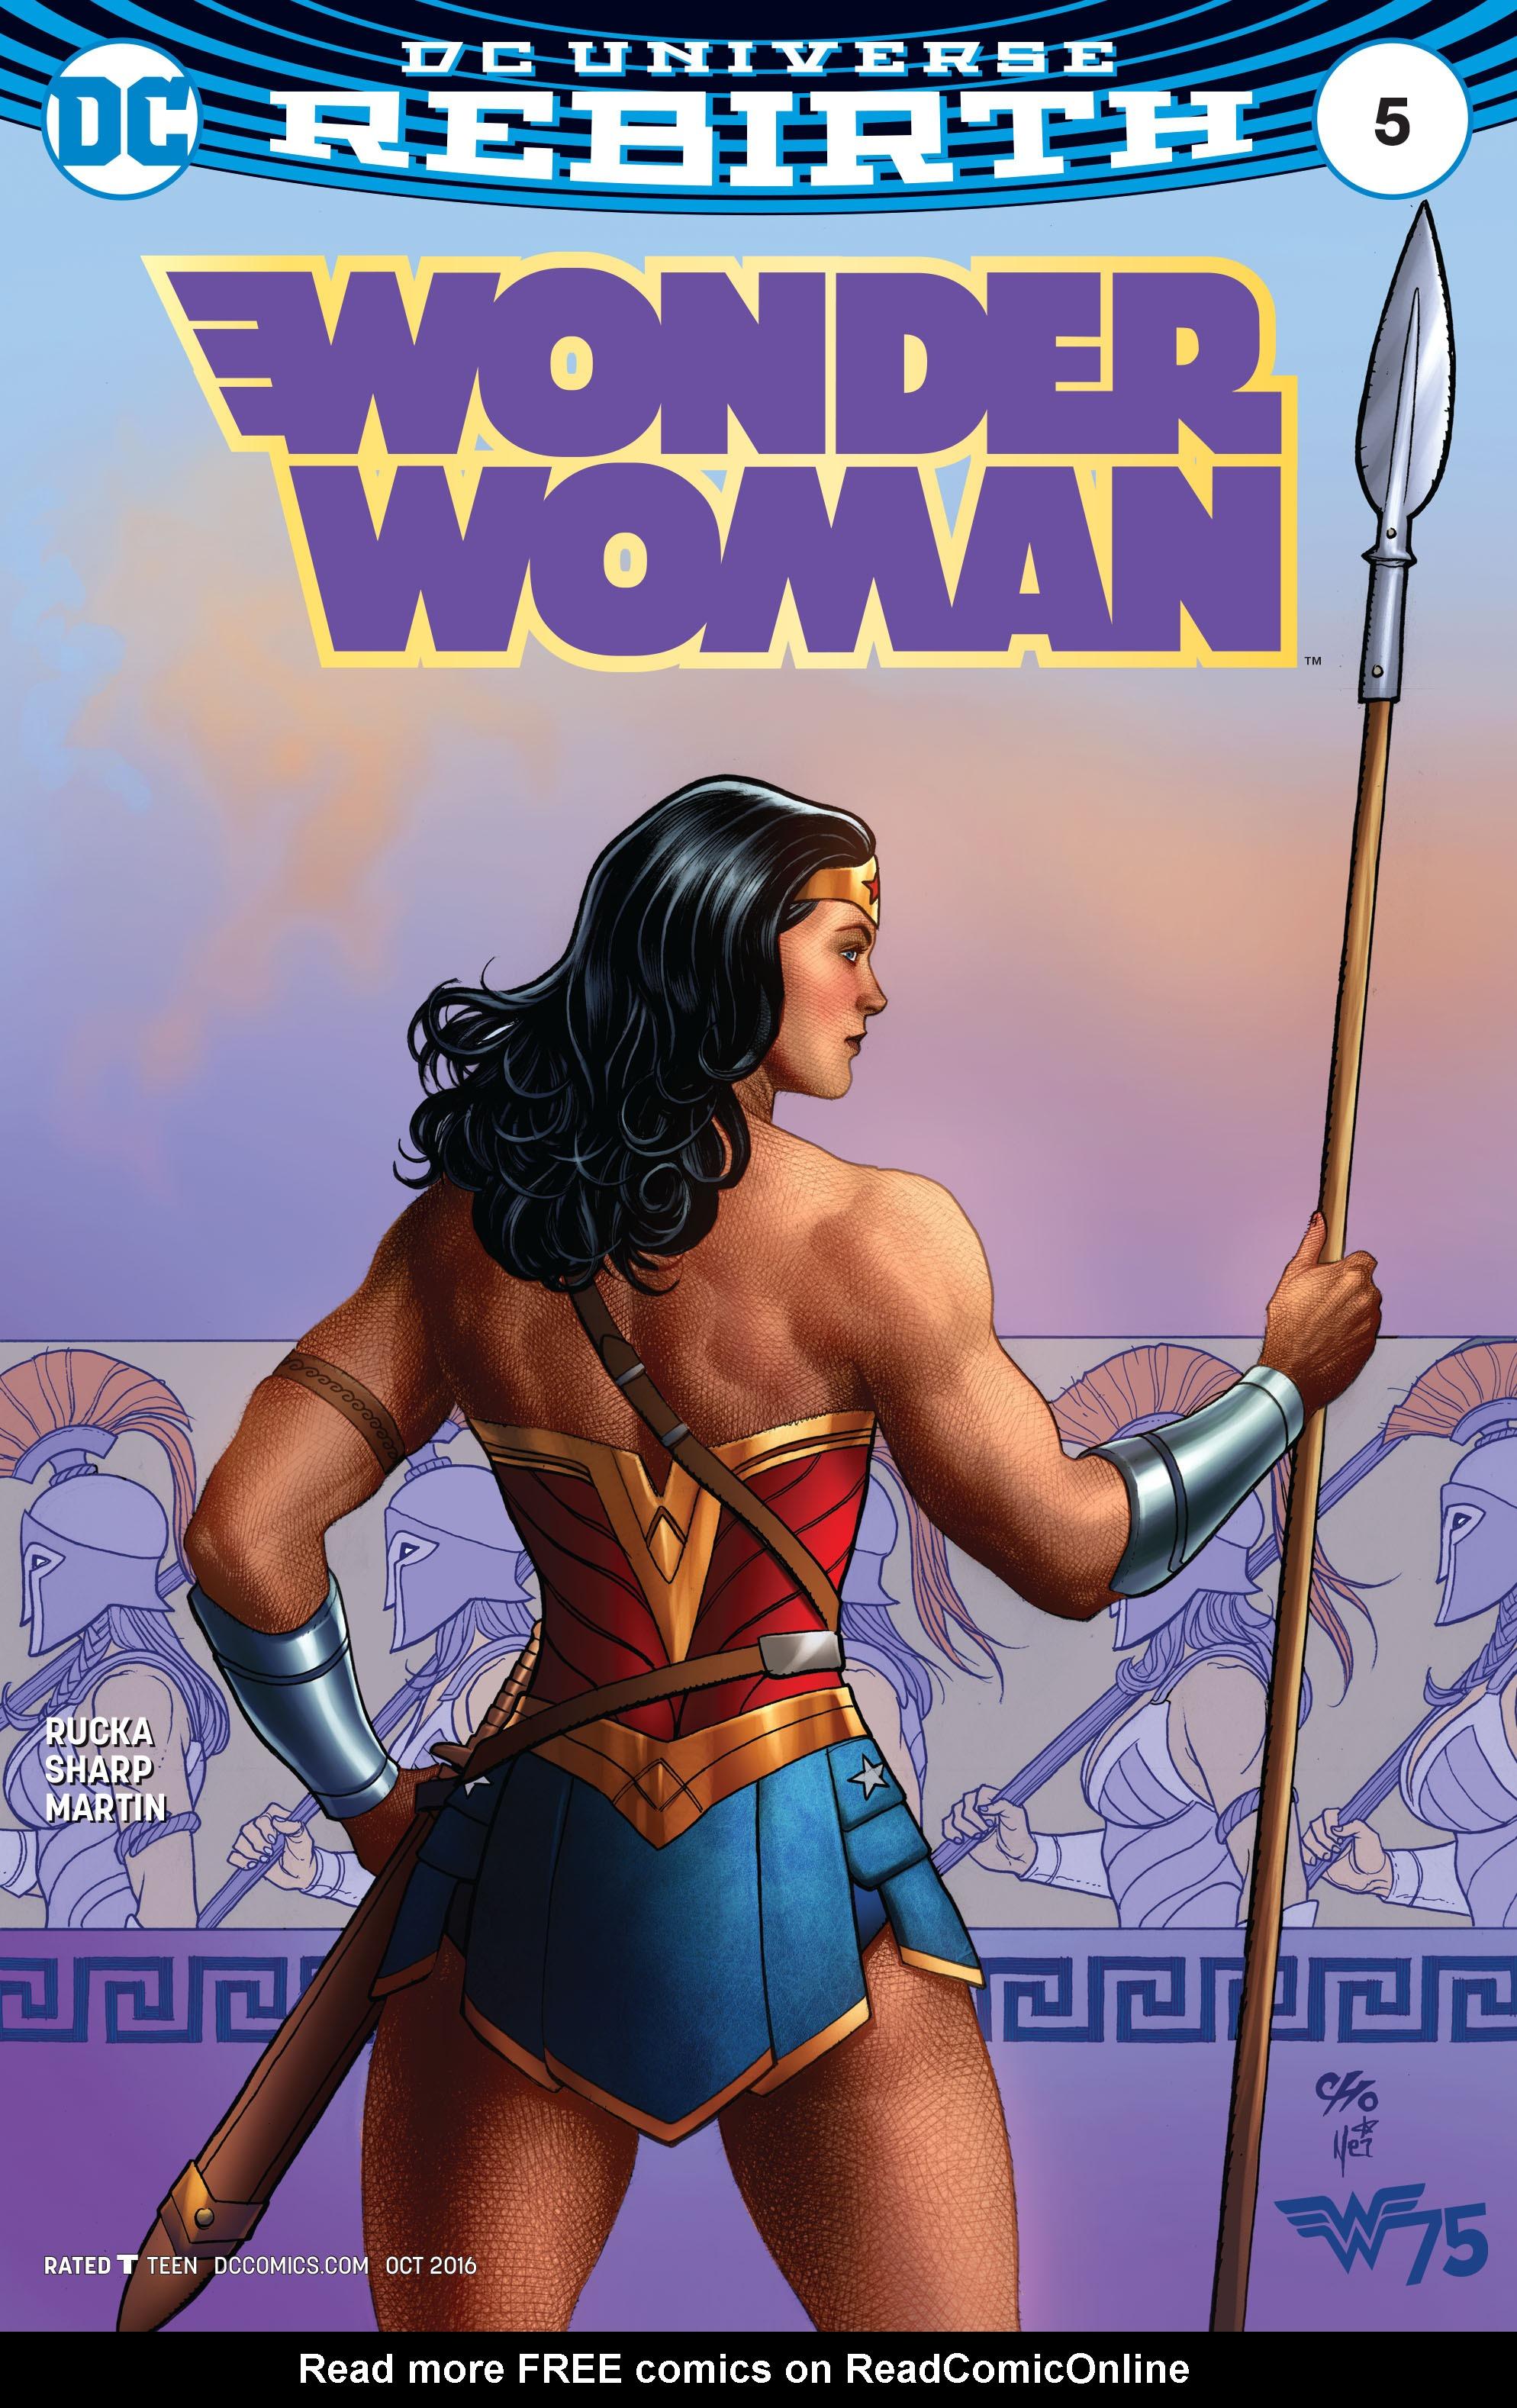 Read online Wonder Woman (2016) comic -  Issue #5 - 2